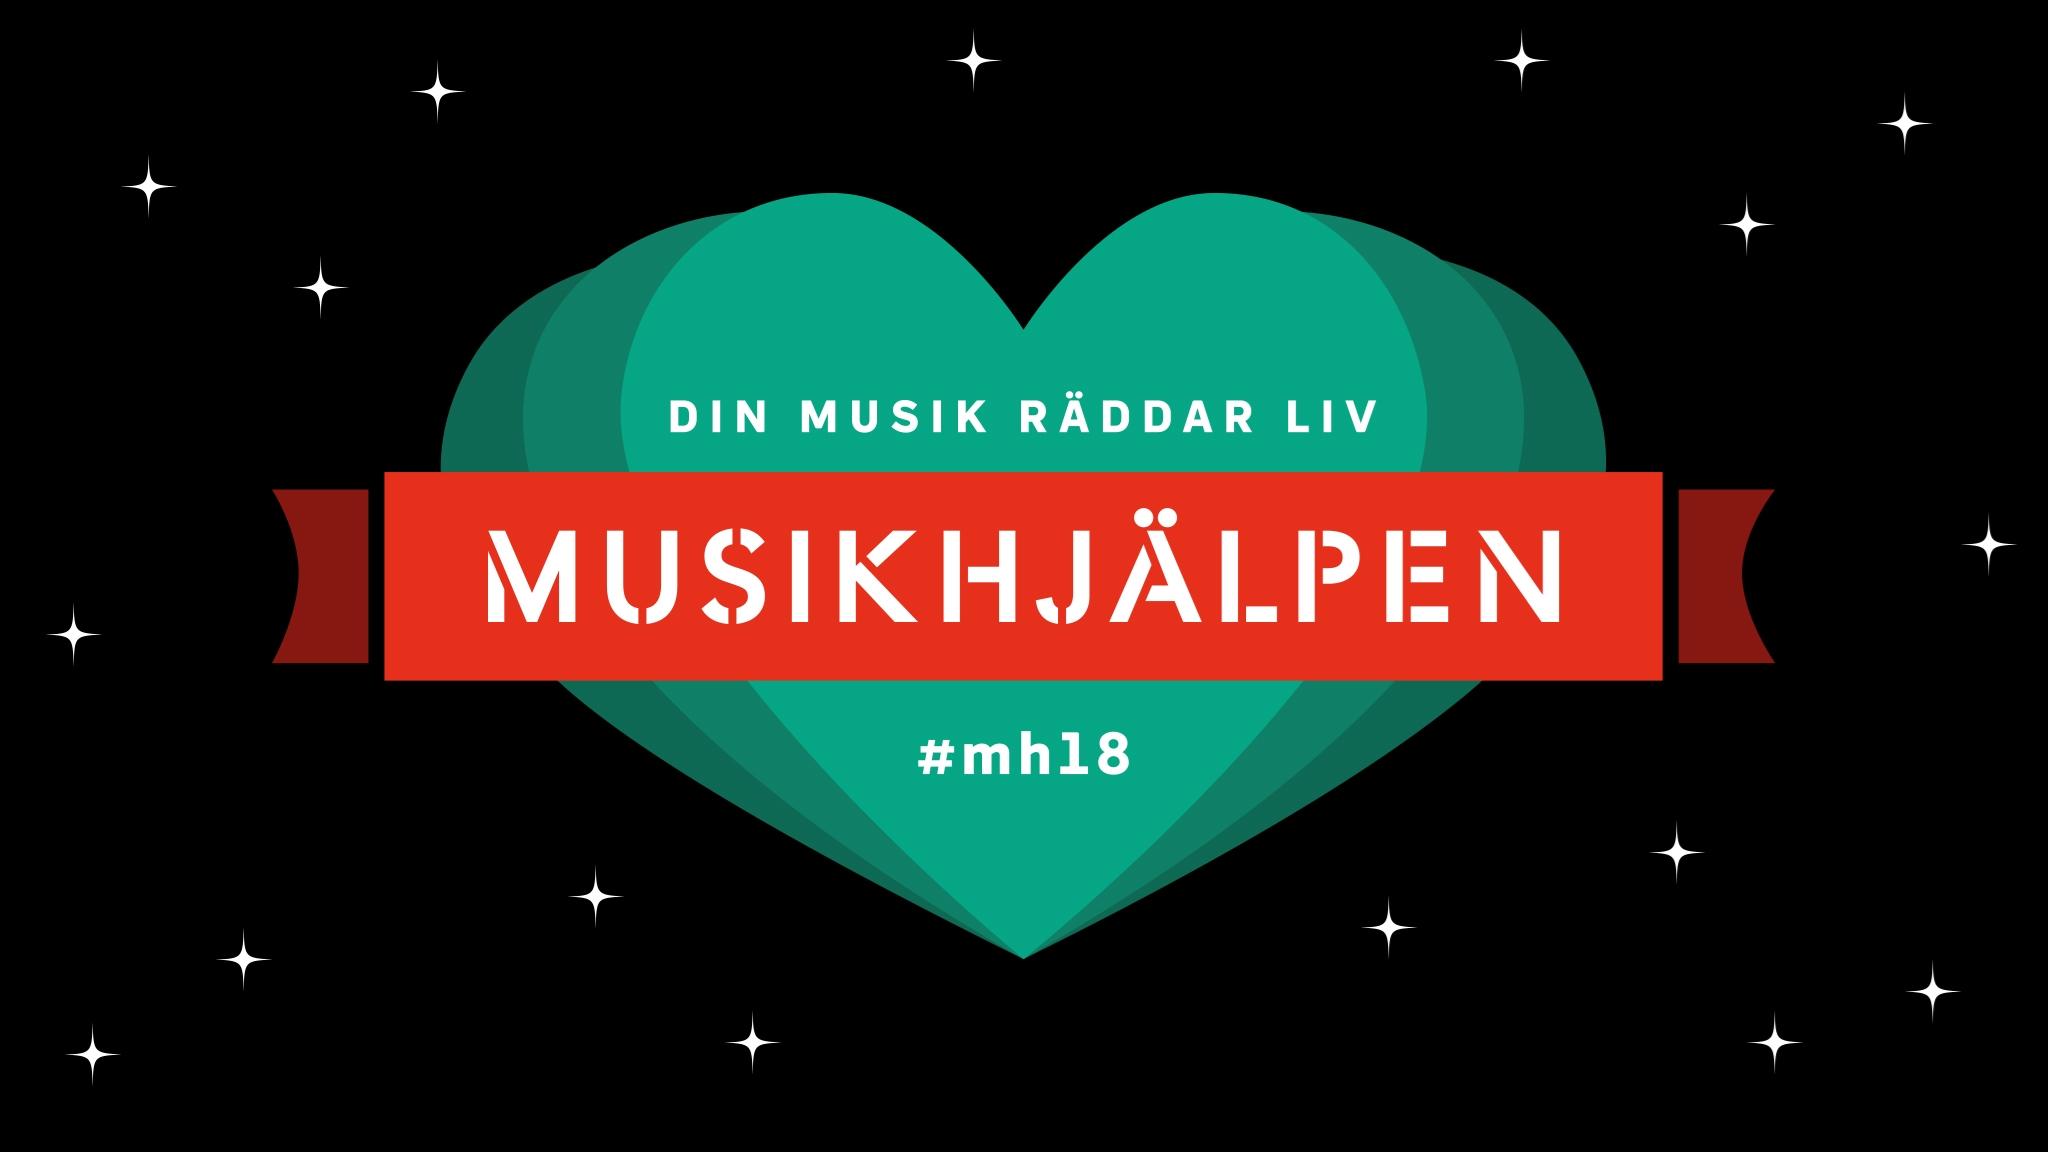 Rabadang hjärta Musikhjälpen  d23608656e9a6